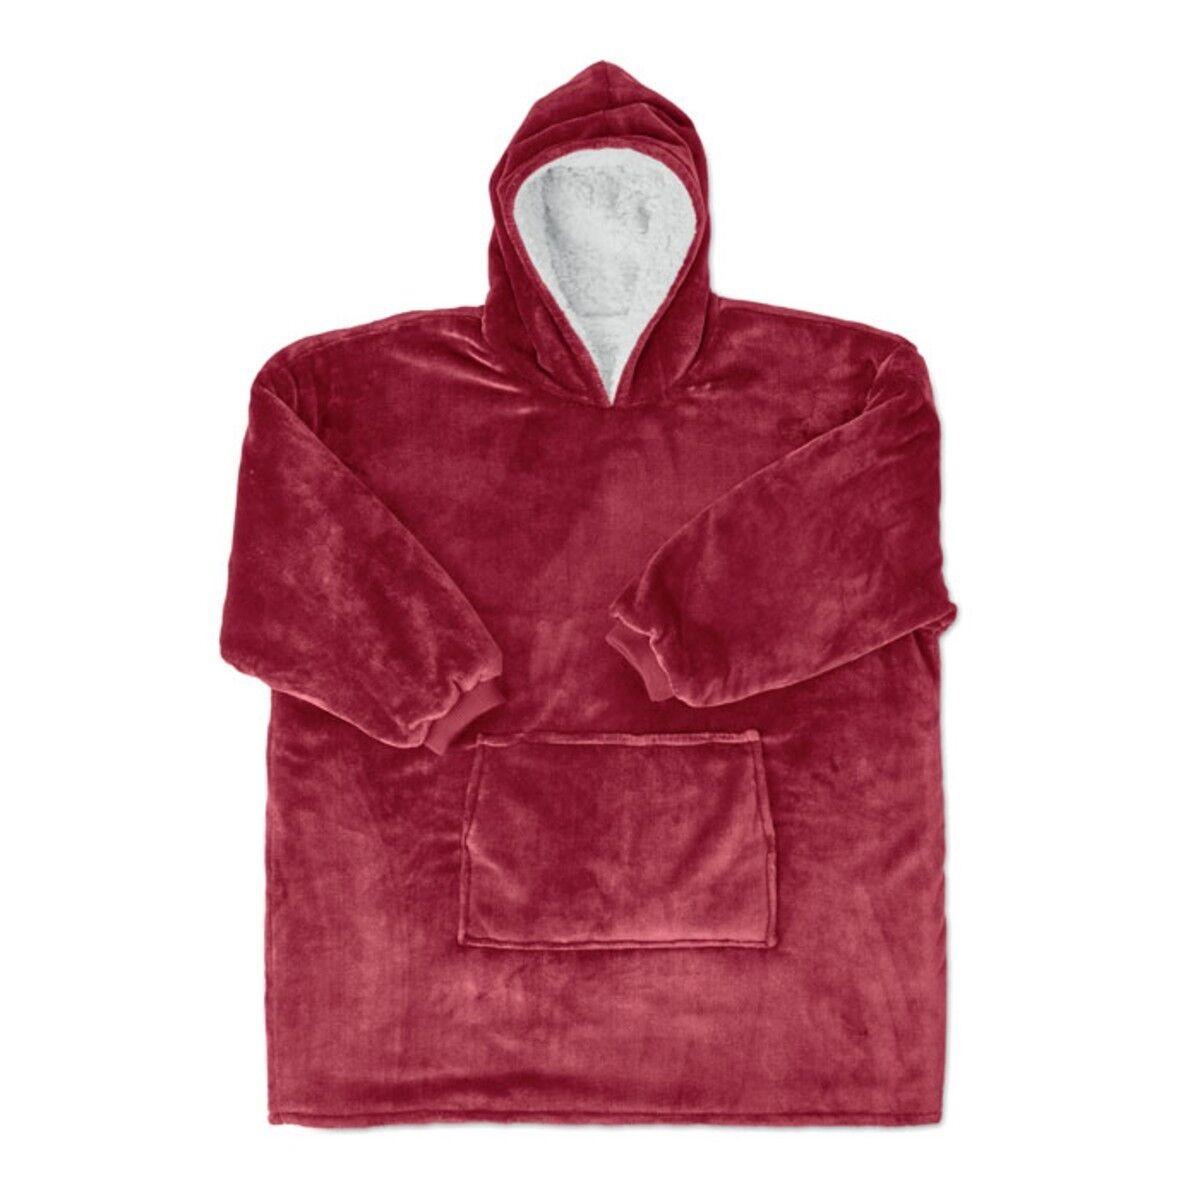 Blanket Sweatshirt in Burgundy colour